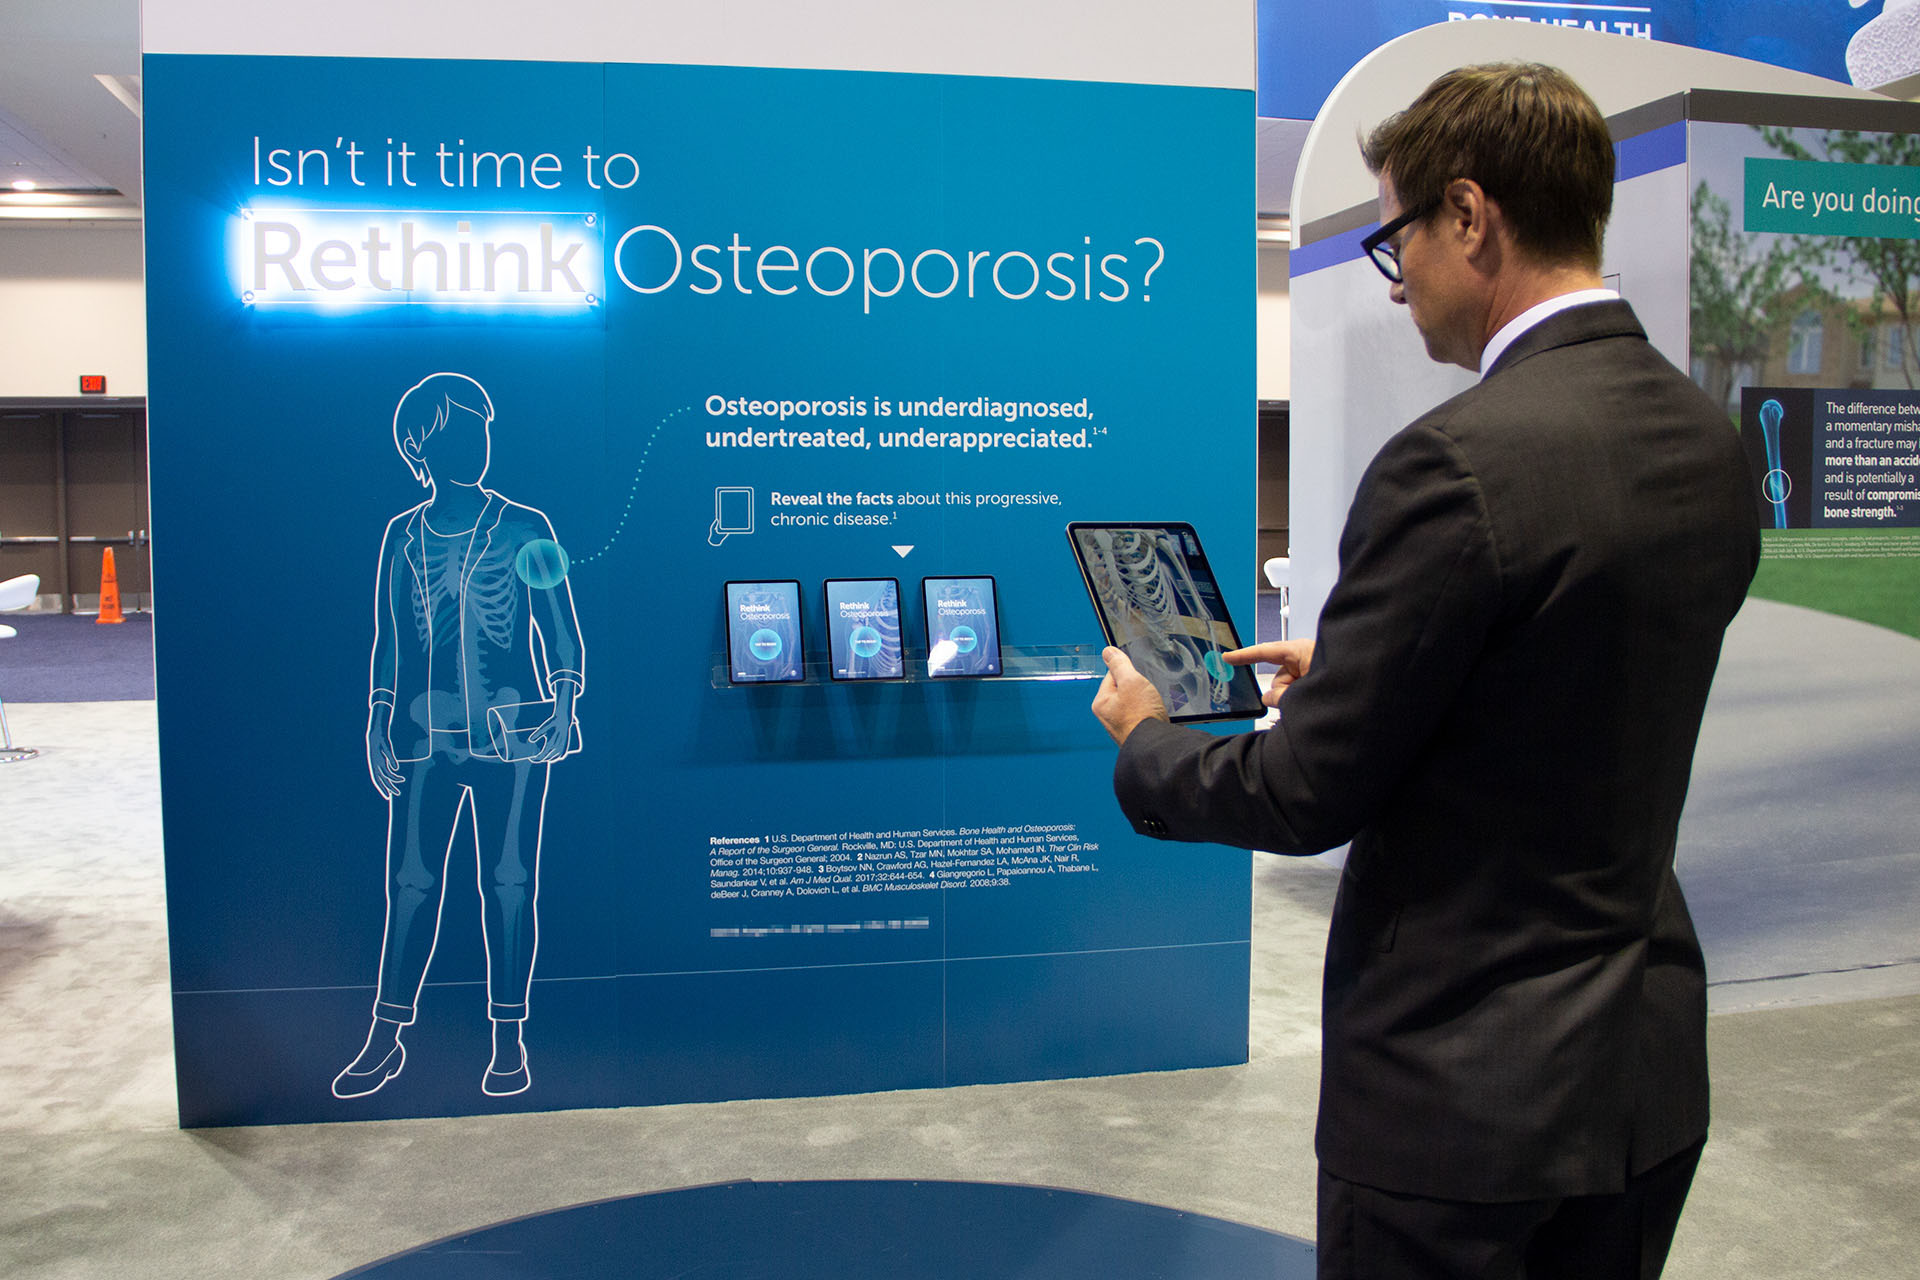 axs-studio-medical-congress-booth-interactive-AR-osteporosis-01